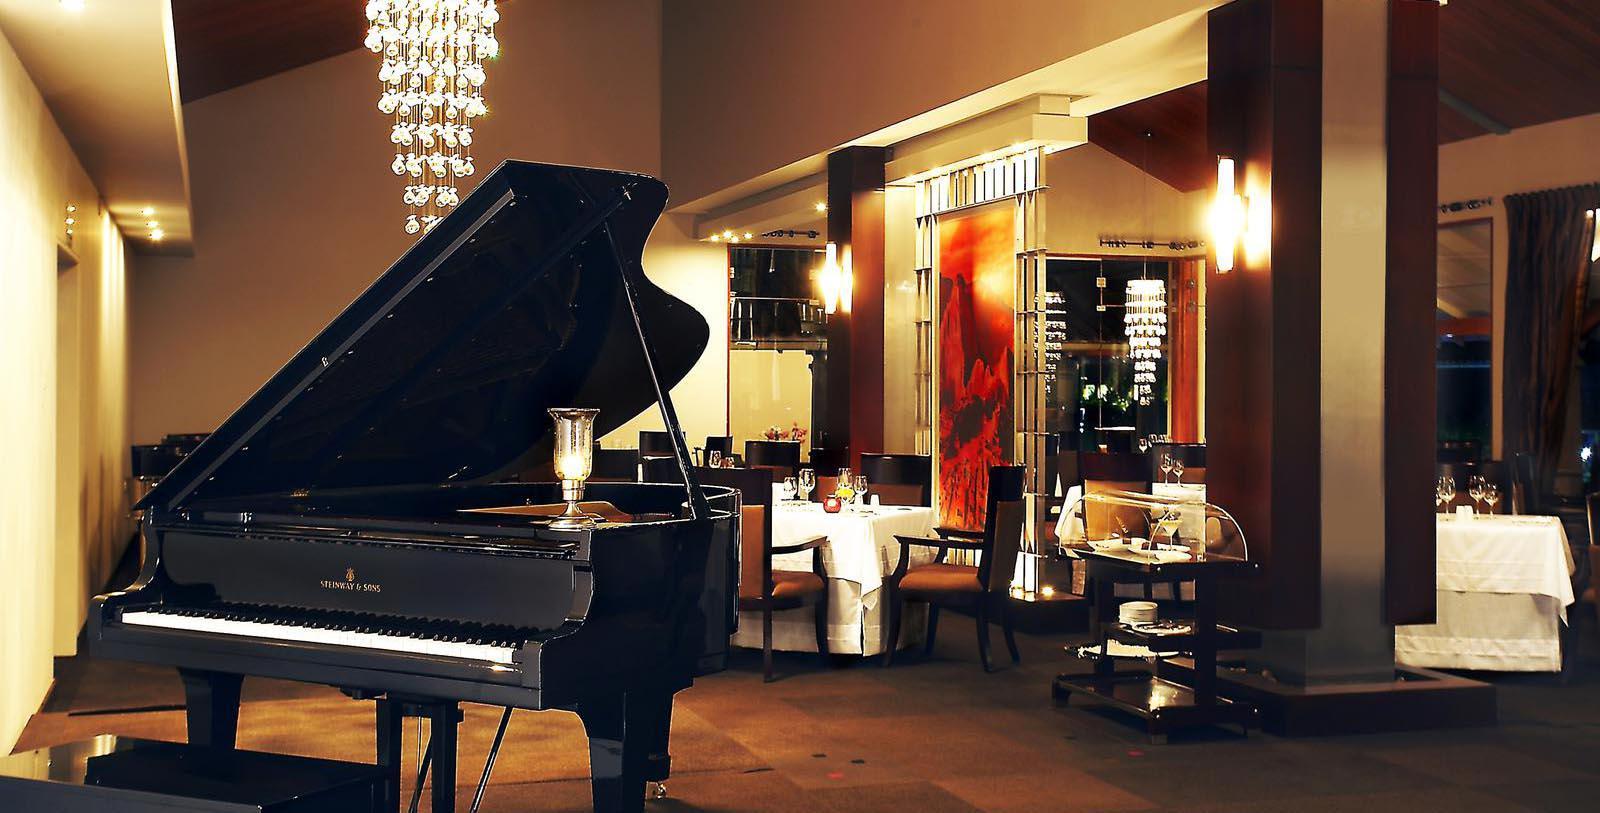 Image of grand piano in restaurant Aranwa Sacred Valley, 1900, Member of Historic Hotels Worldwide, in Urubamba, Peru, Taste